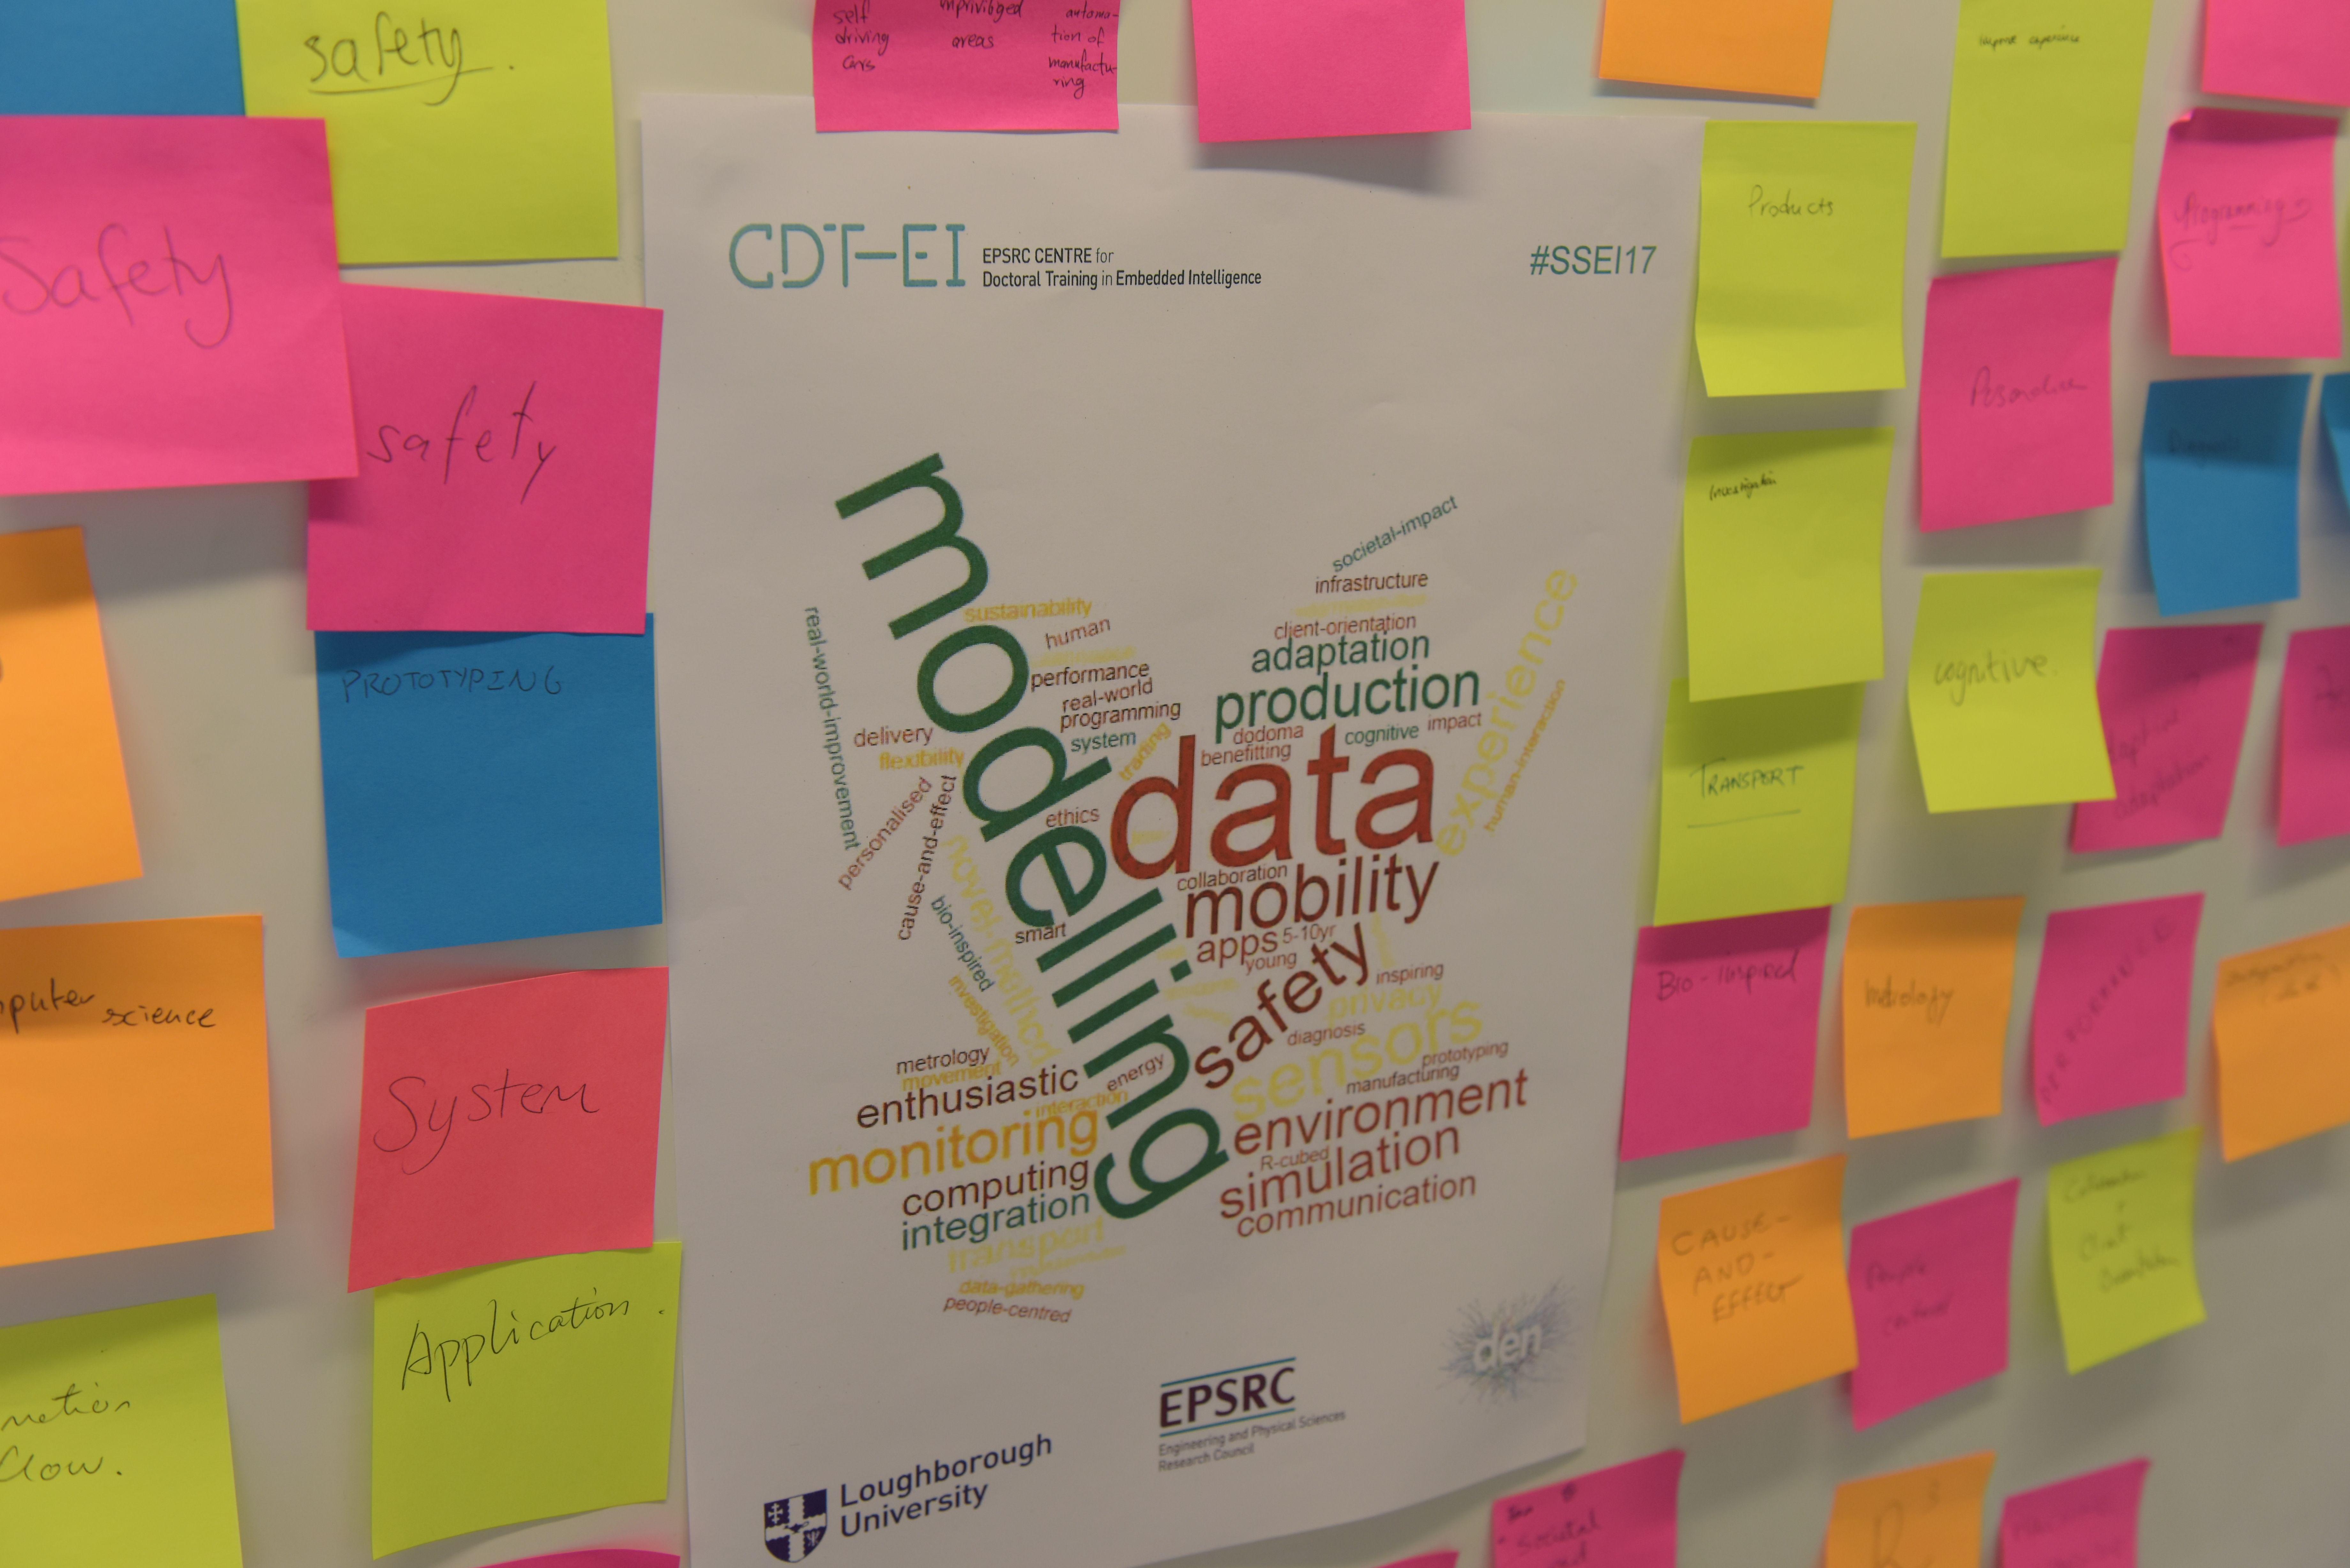 Embedded Intelligence CDT & the Digital Economy's Summer School